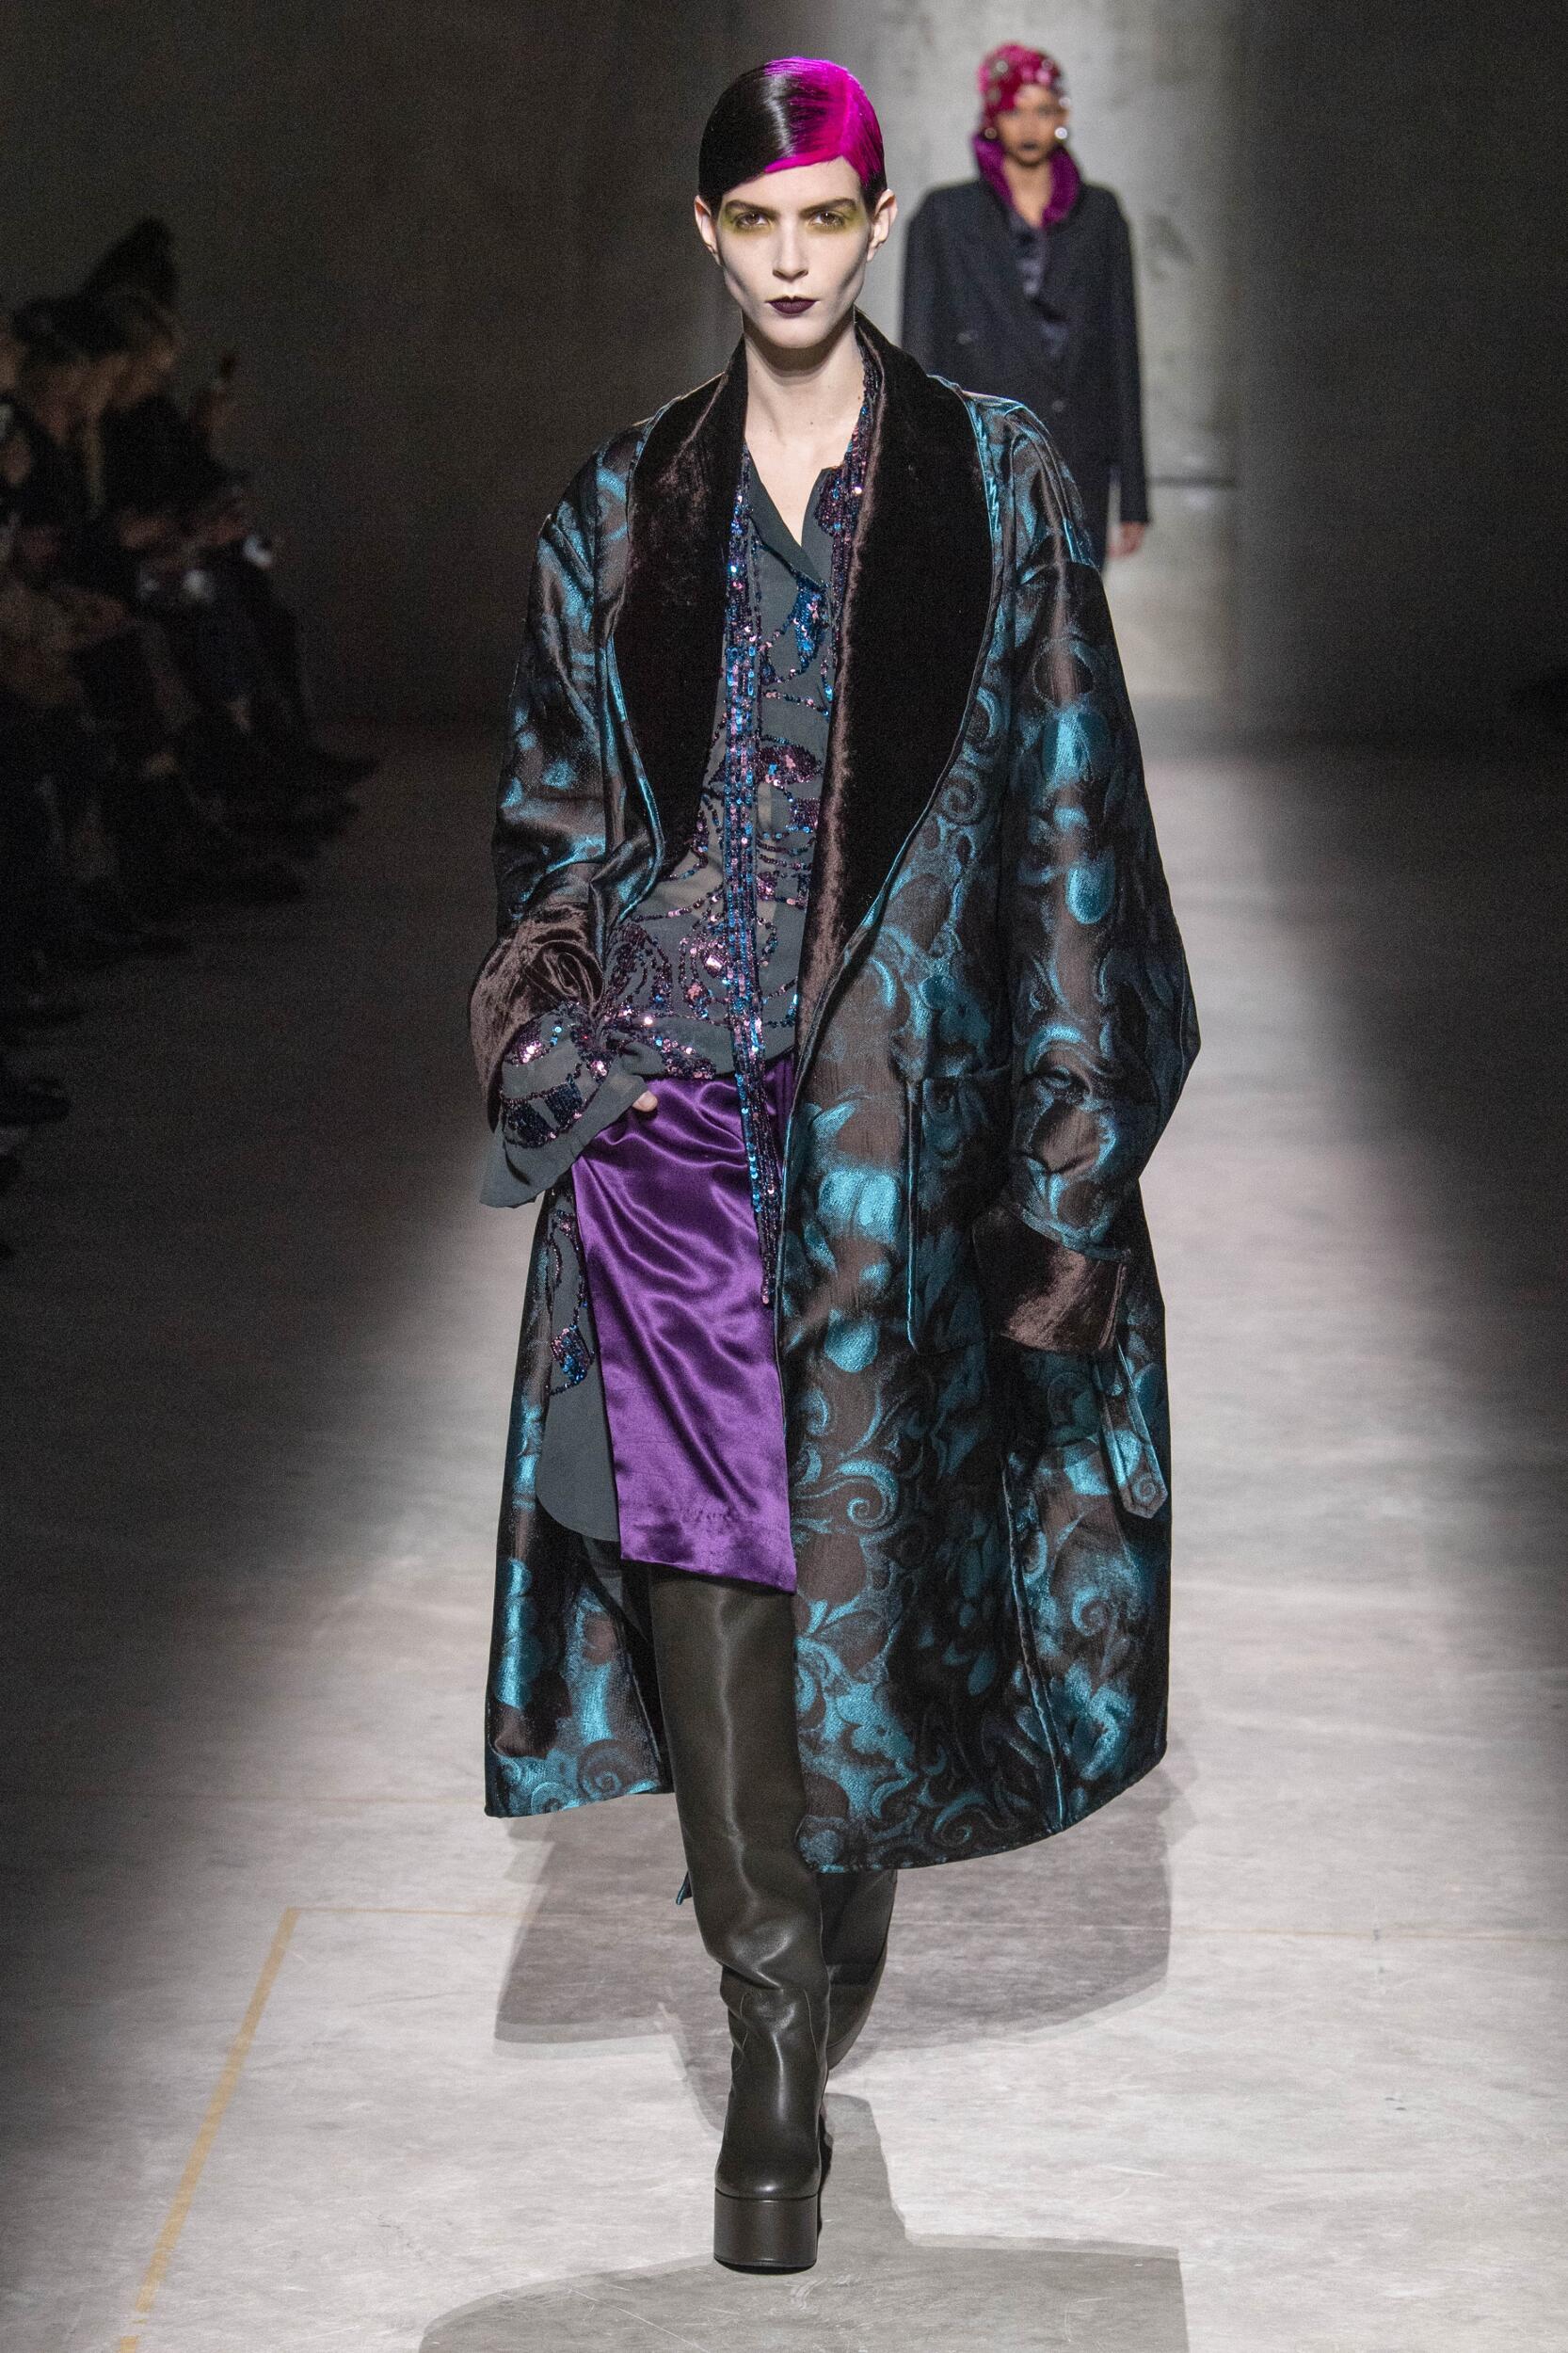 Fall Winter Fashion Trends 2020 Dries Van Noten